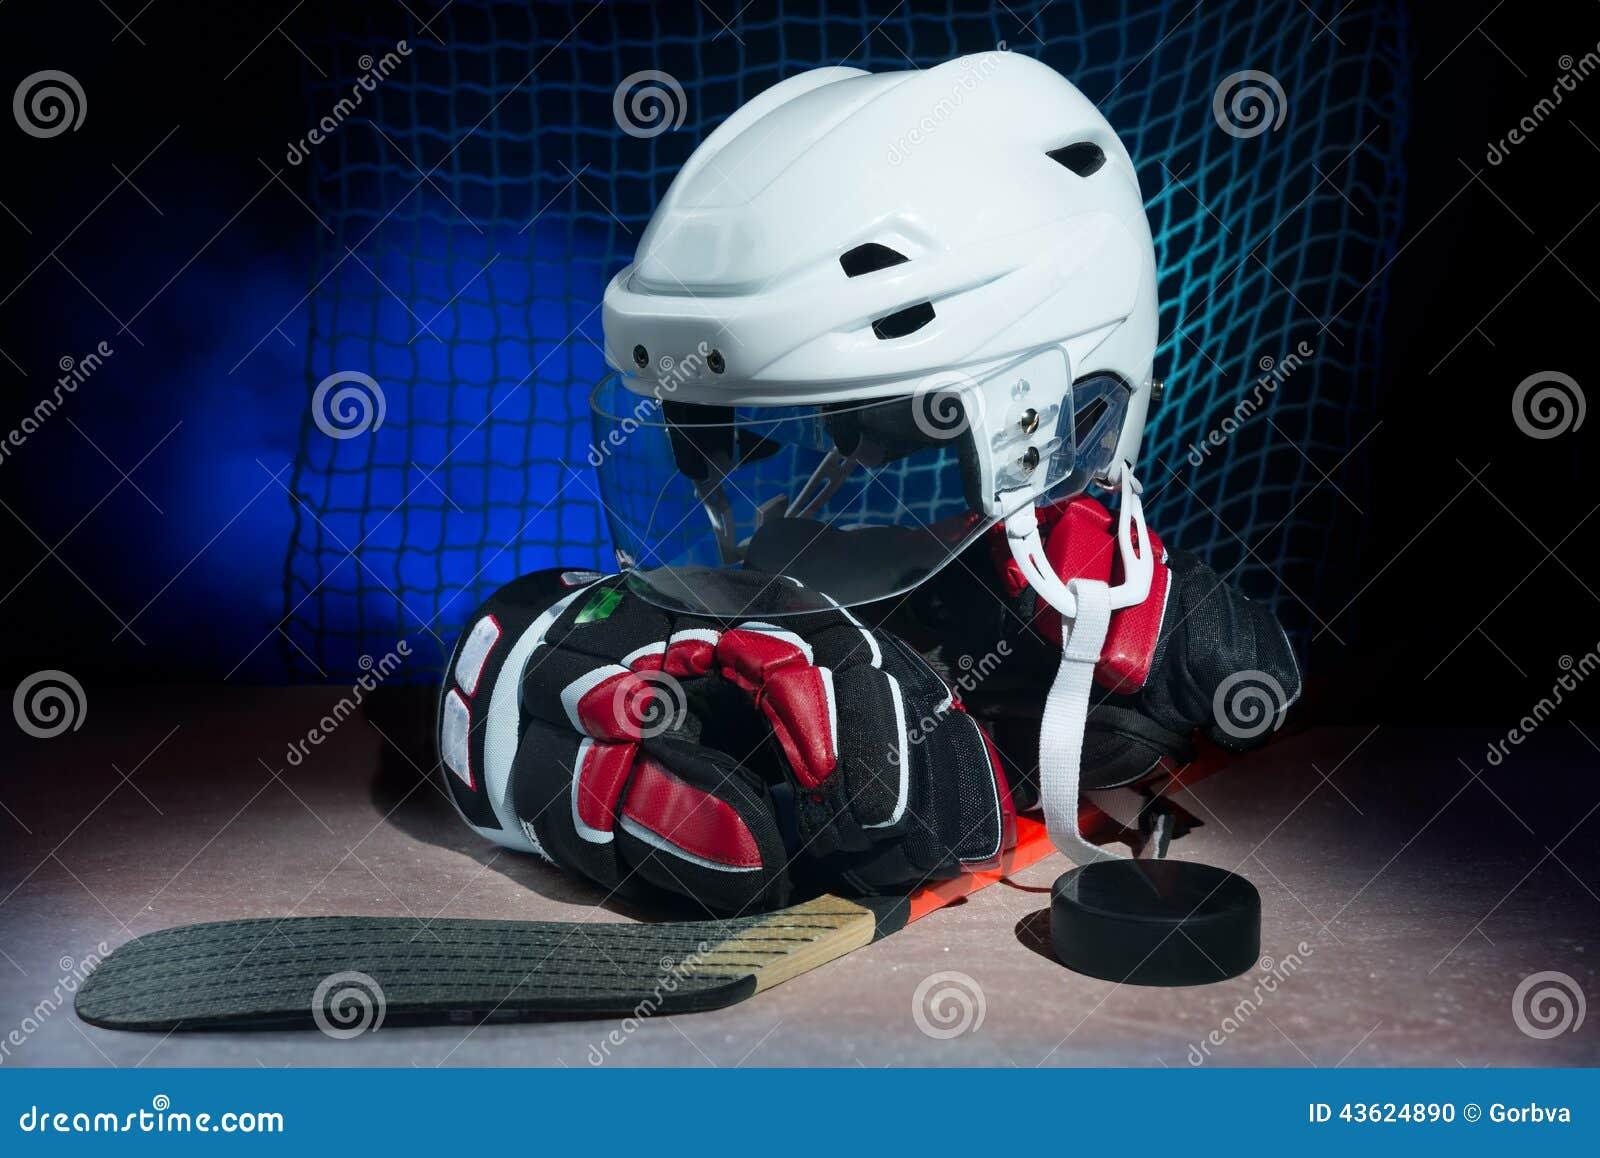 Hockey gear o ice